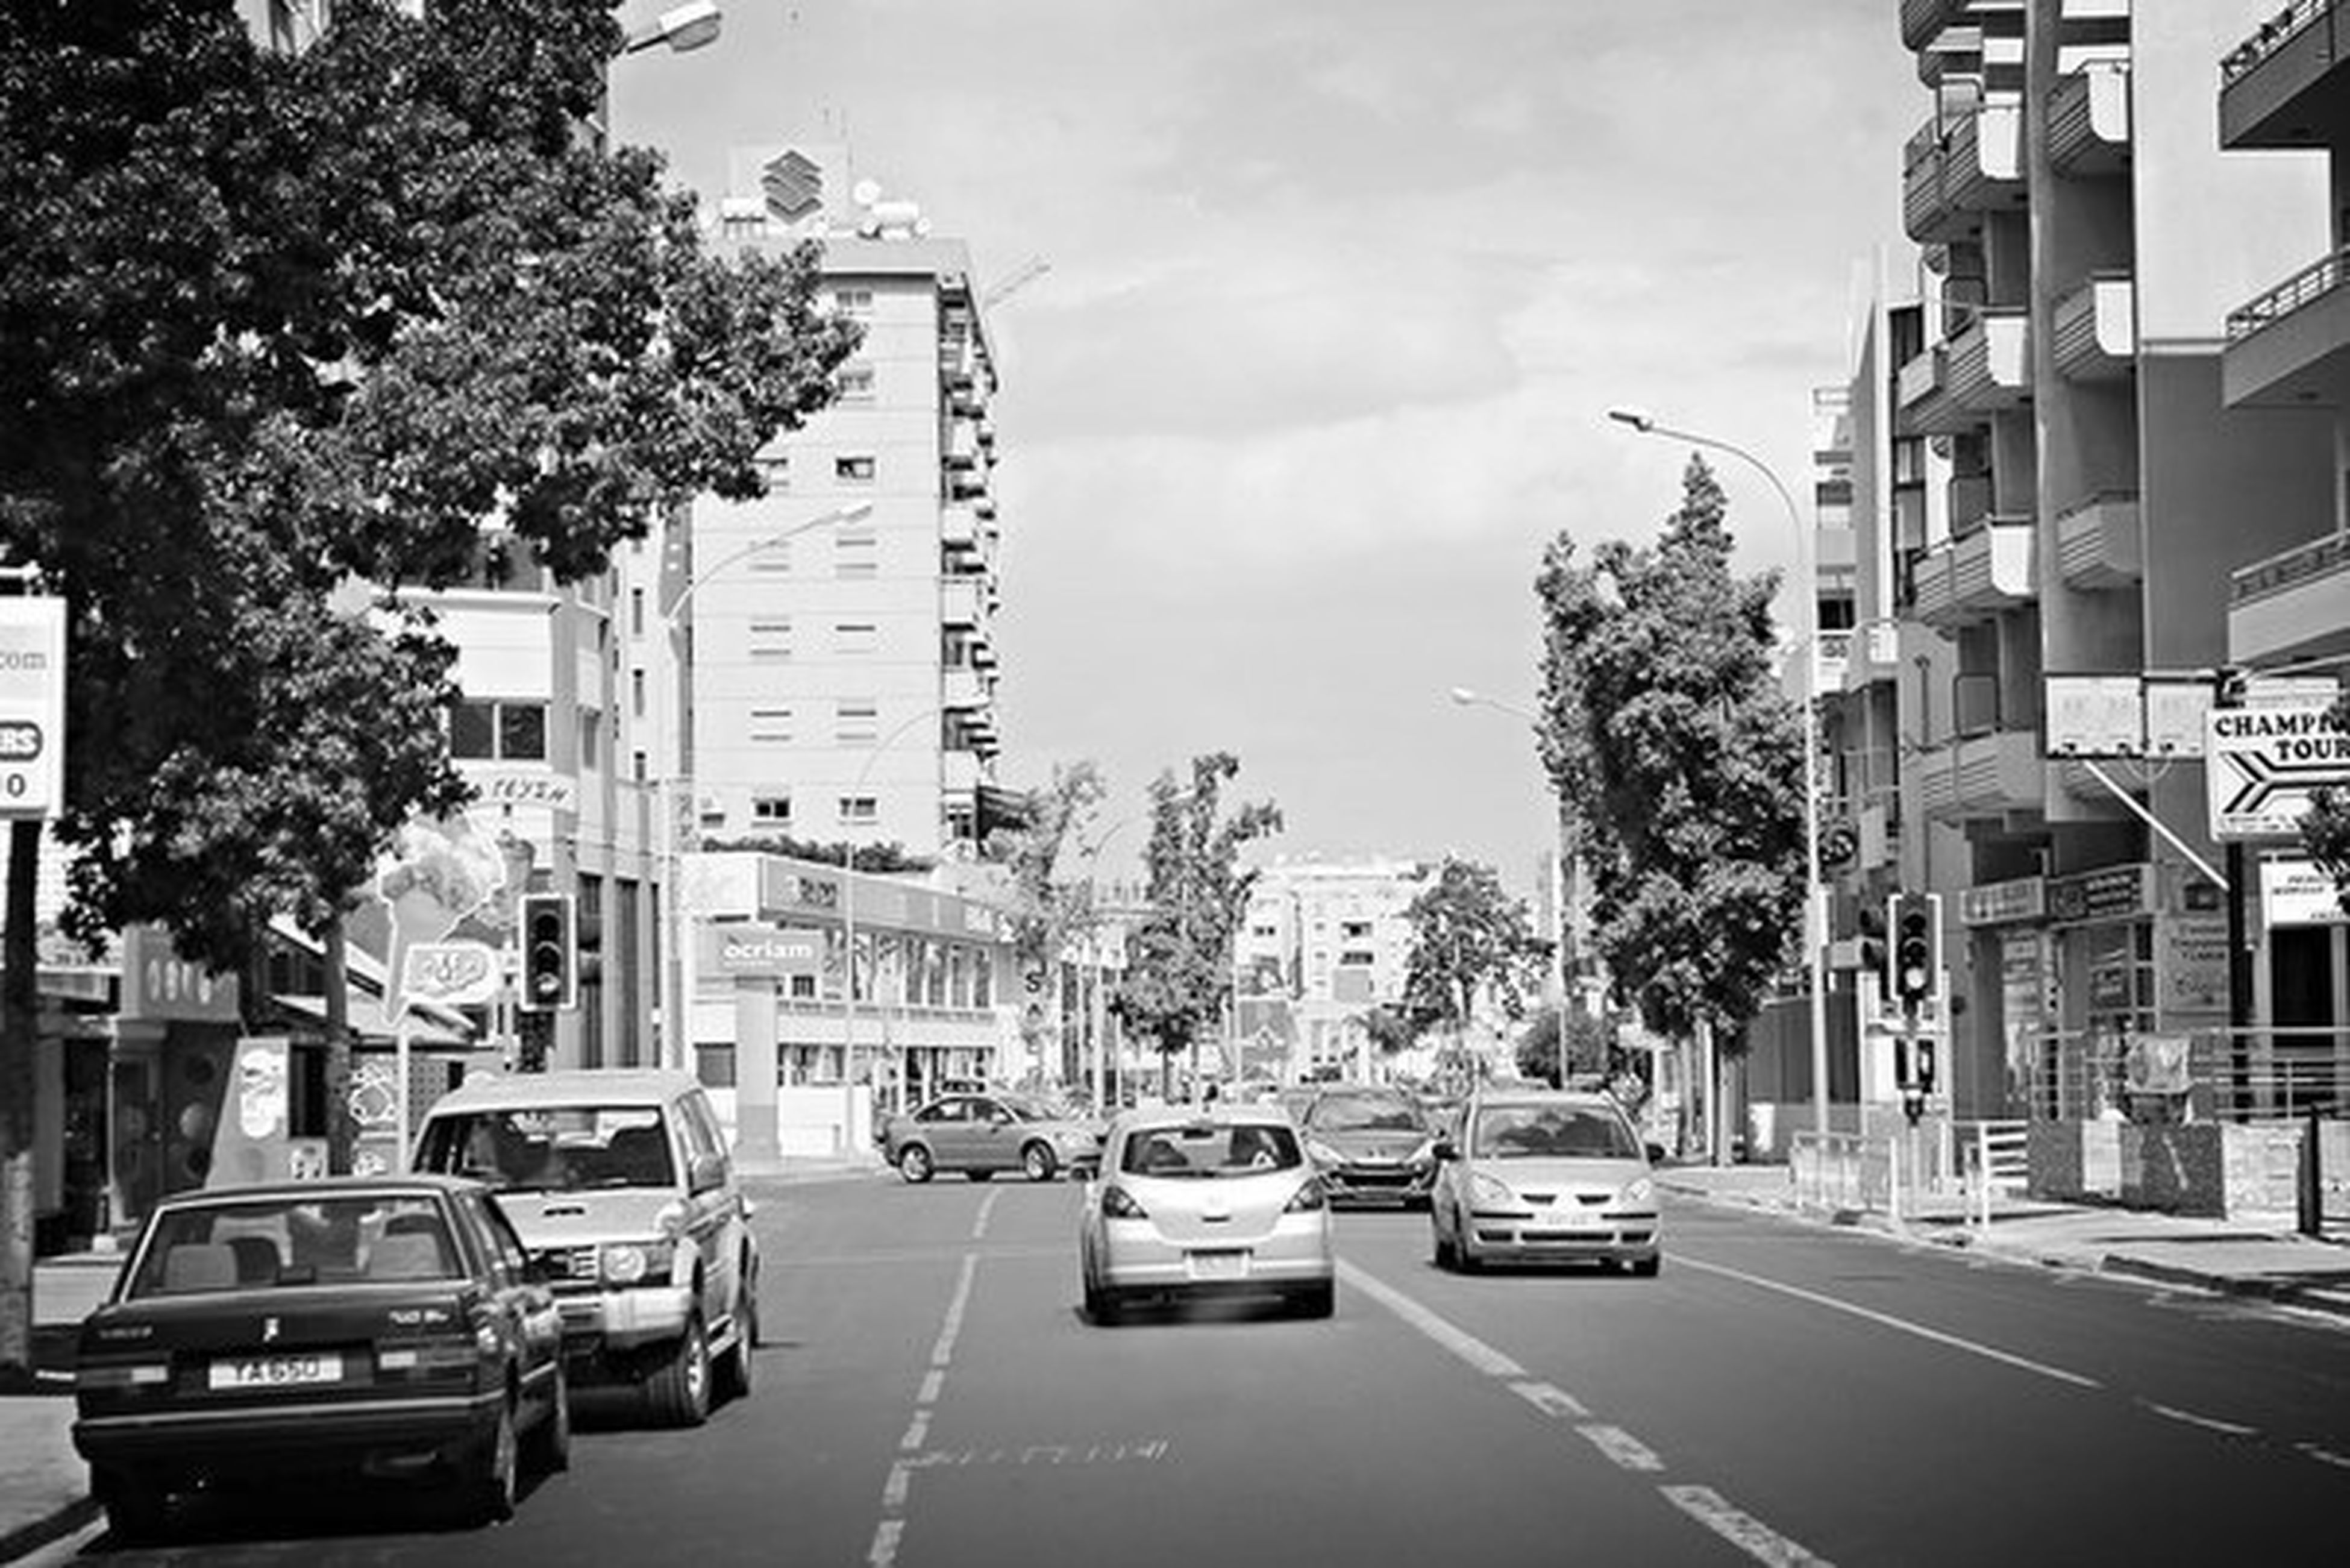 Cyprus, Larnaca Traveling City On The Road Hello World